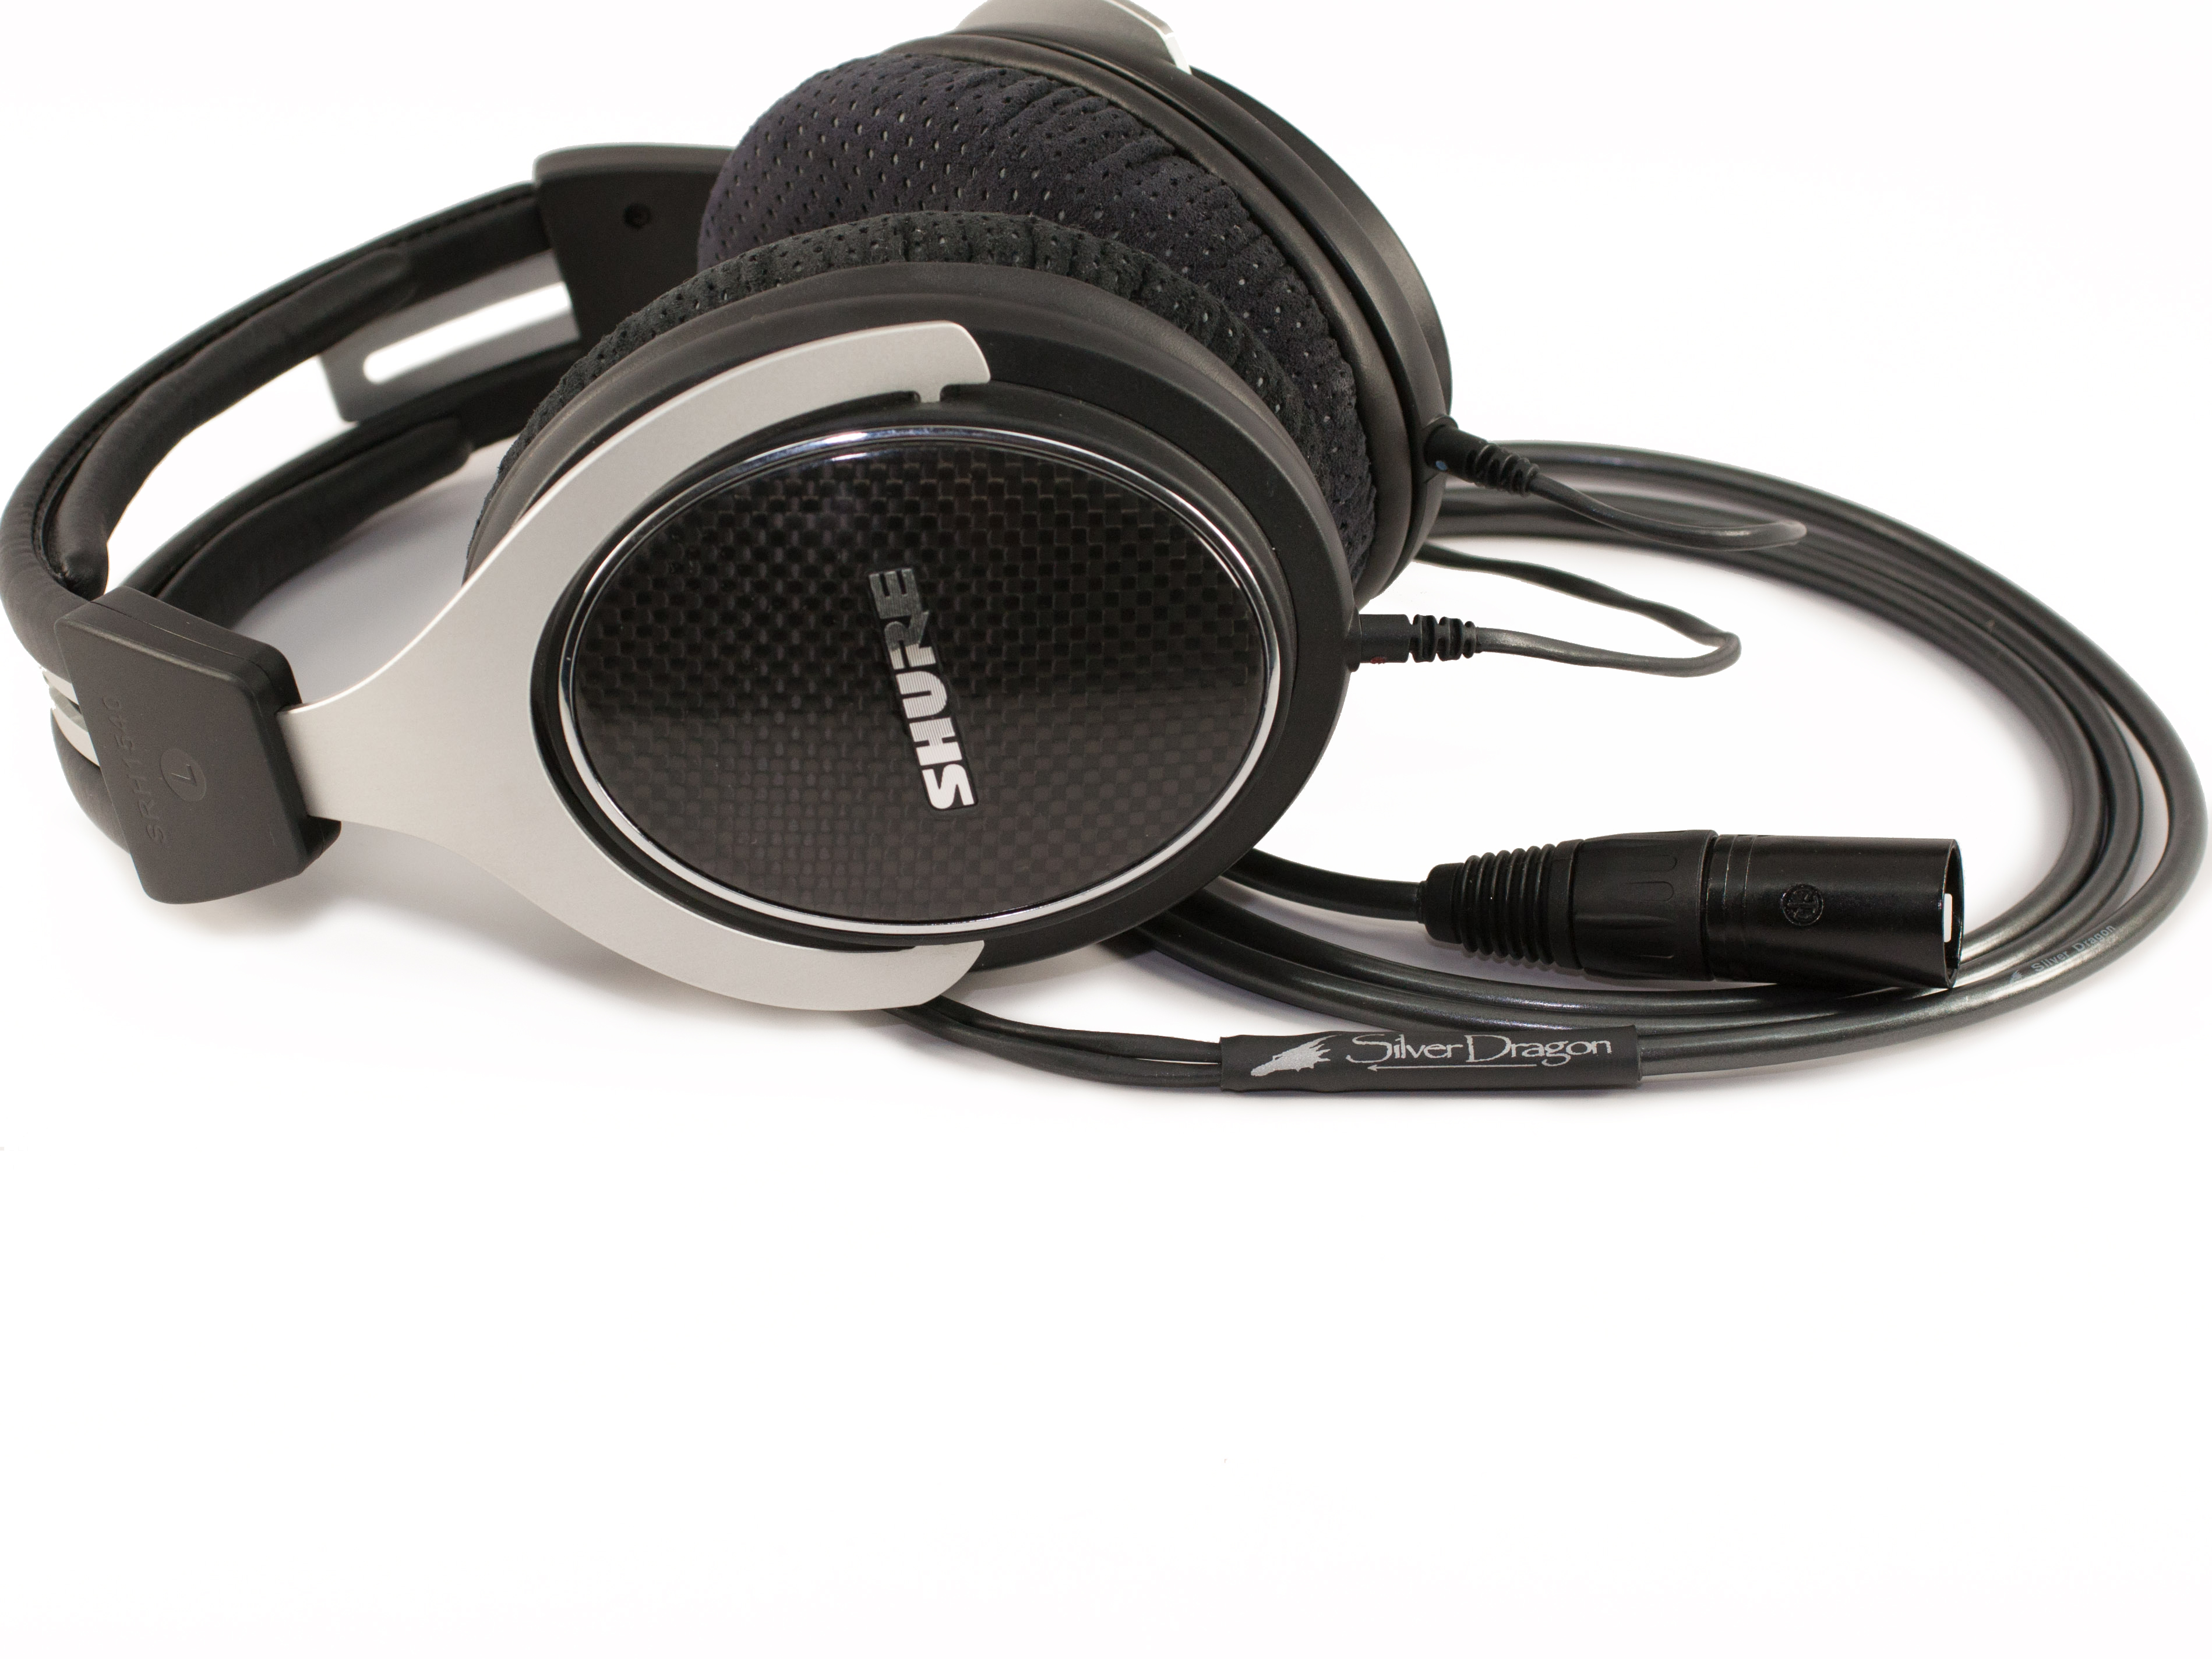 Silver Dragon V3 Shure Headphone Cable